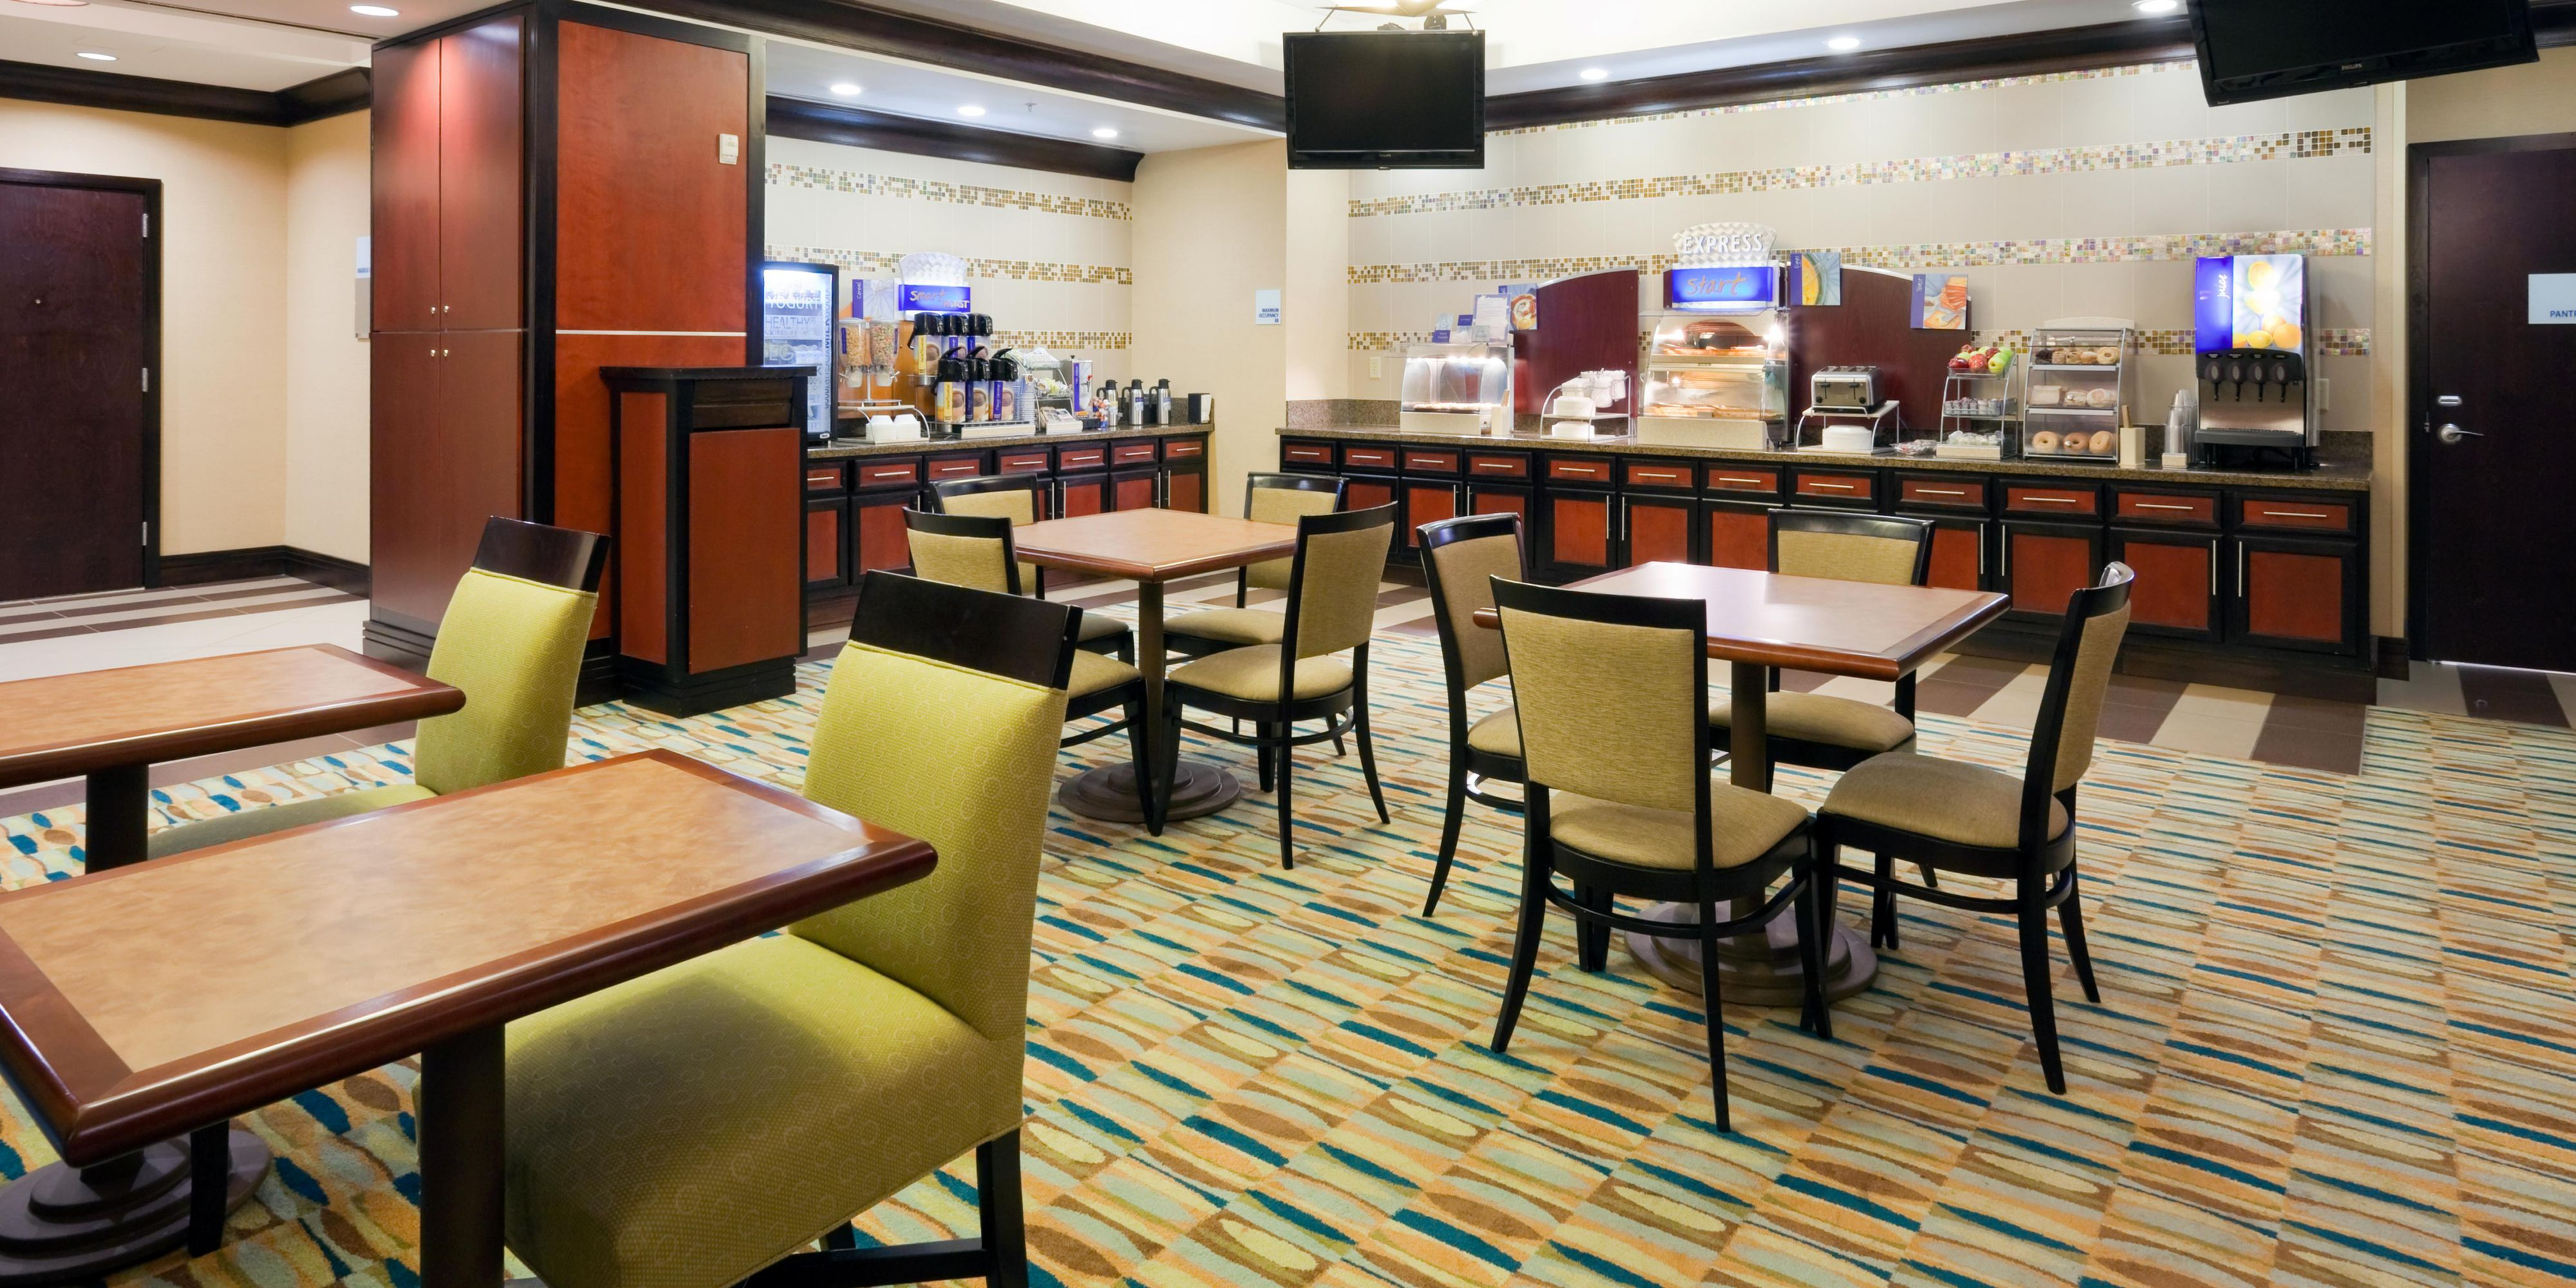 Alabama mobile county saraland - Holiday Inn Express And Suites Saraland 2532820152 2x1